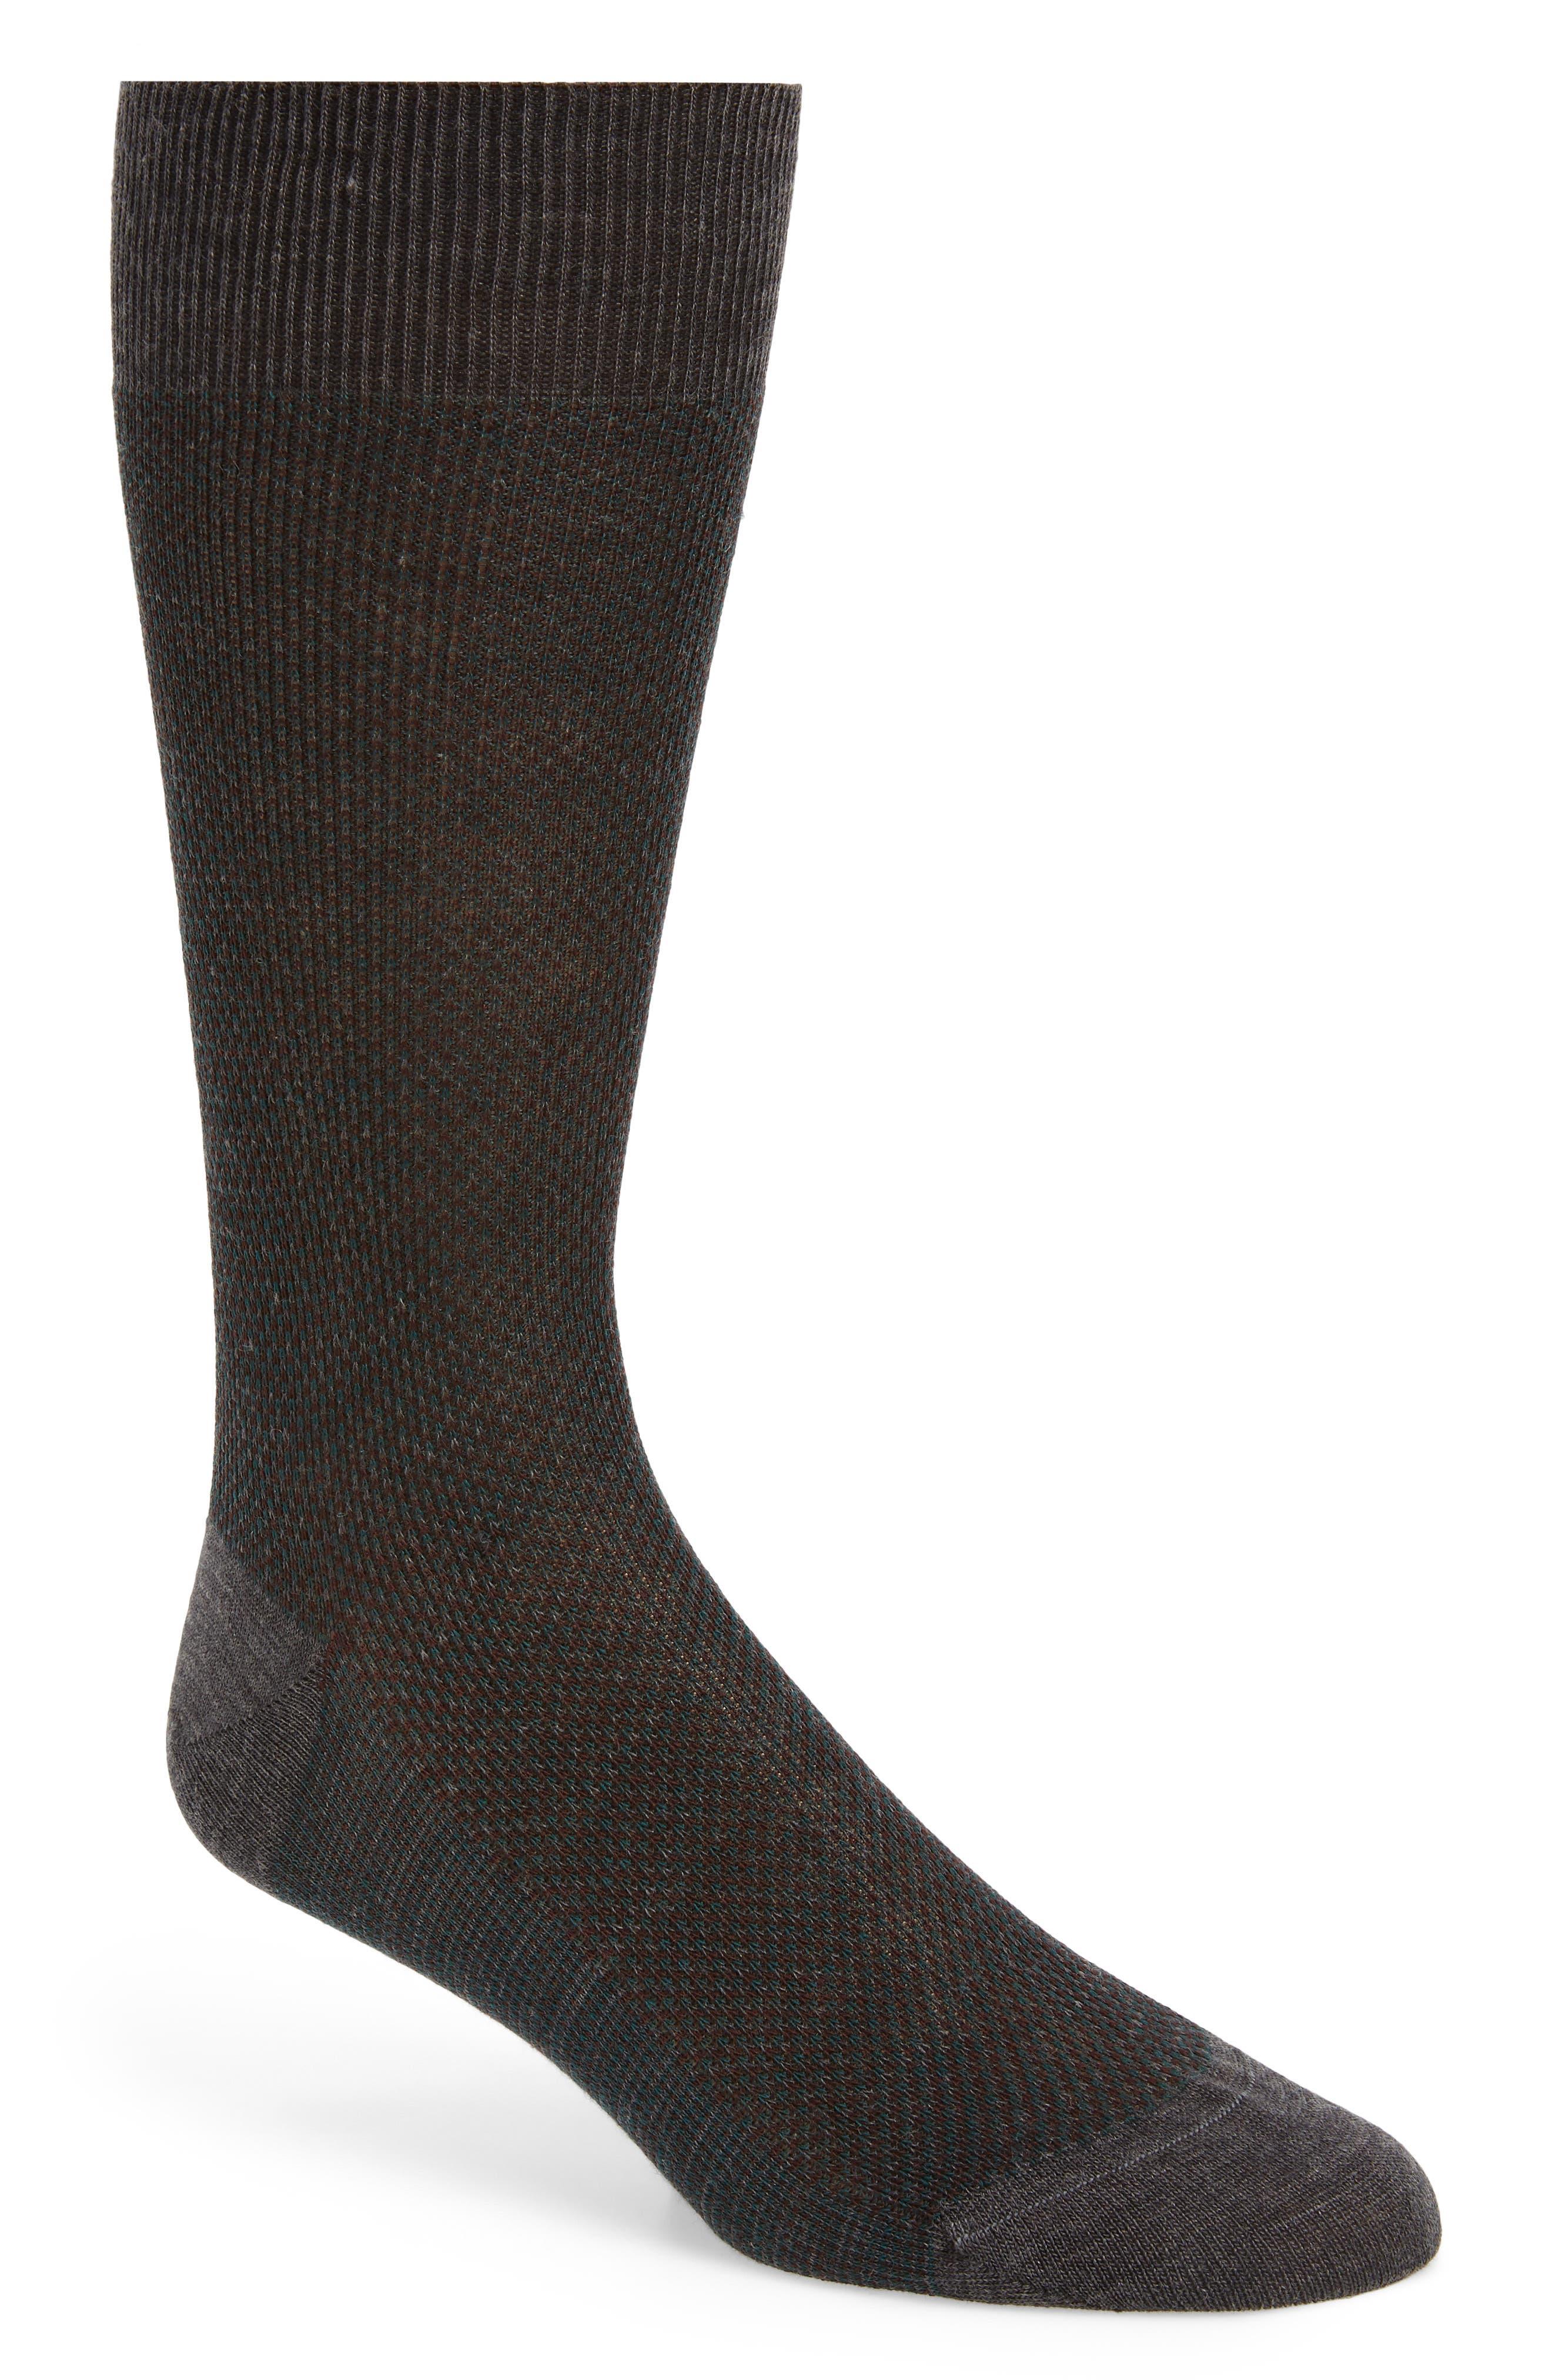 'Vintage Collection - Blenheim' Merino Wool Blend Socks,                         Main,                         color, NEW DARK GREY MIX